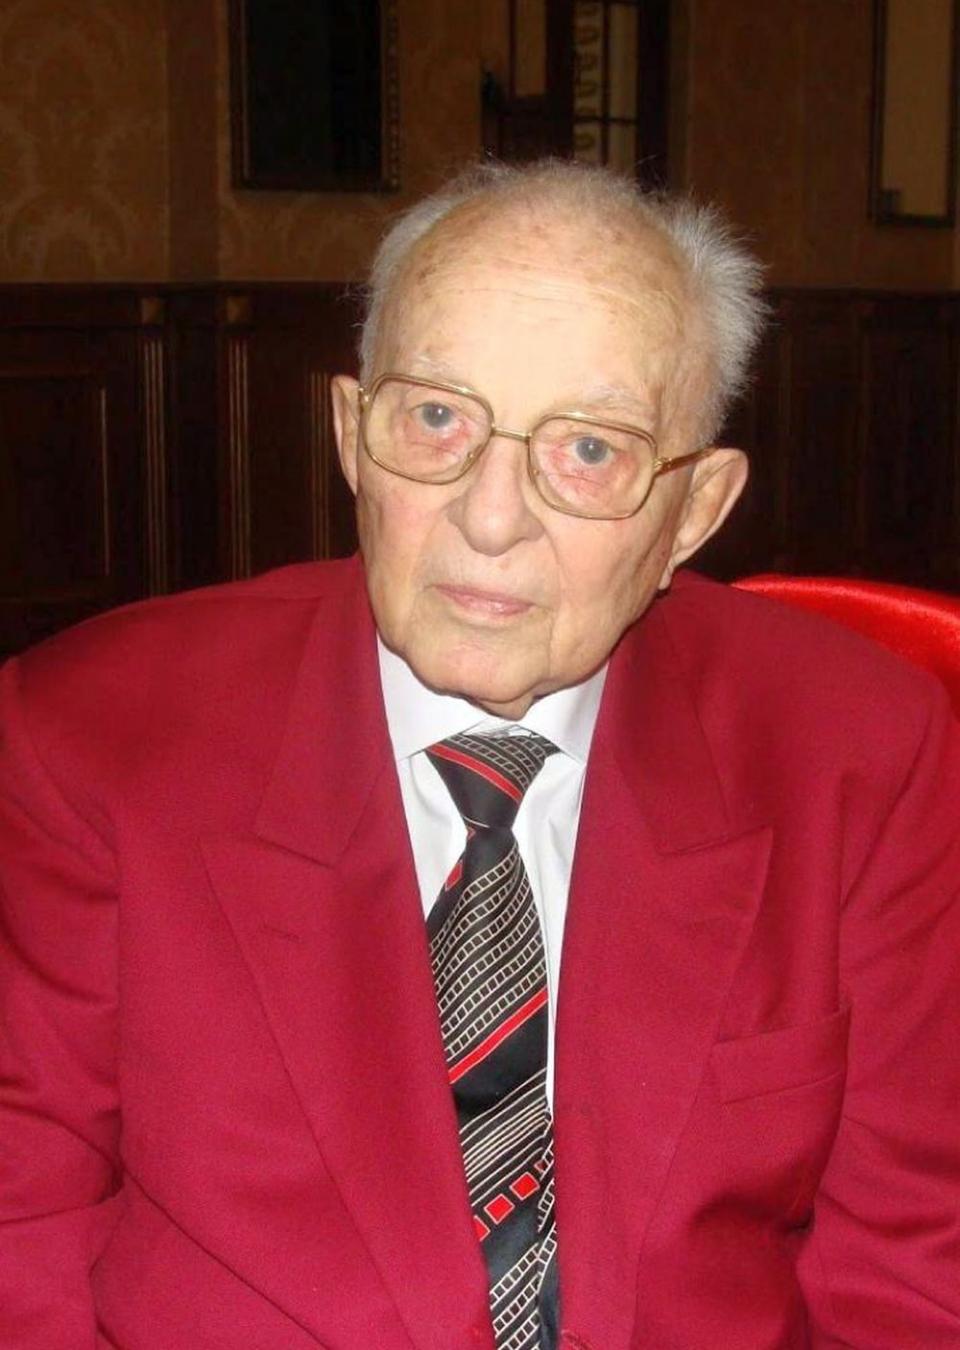 Regretatul acad.prof.dr. George Litarczek avea 94 de ani